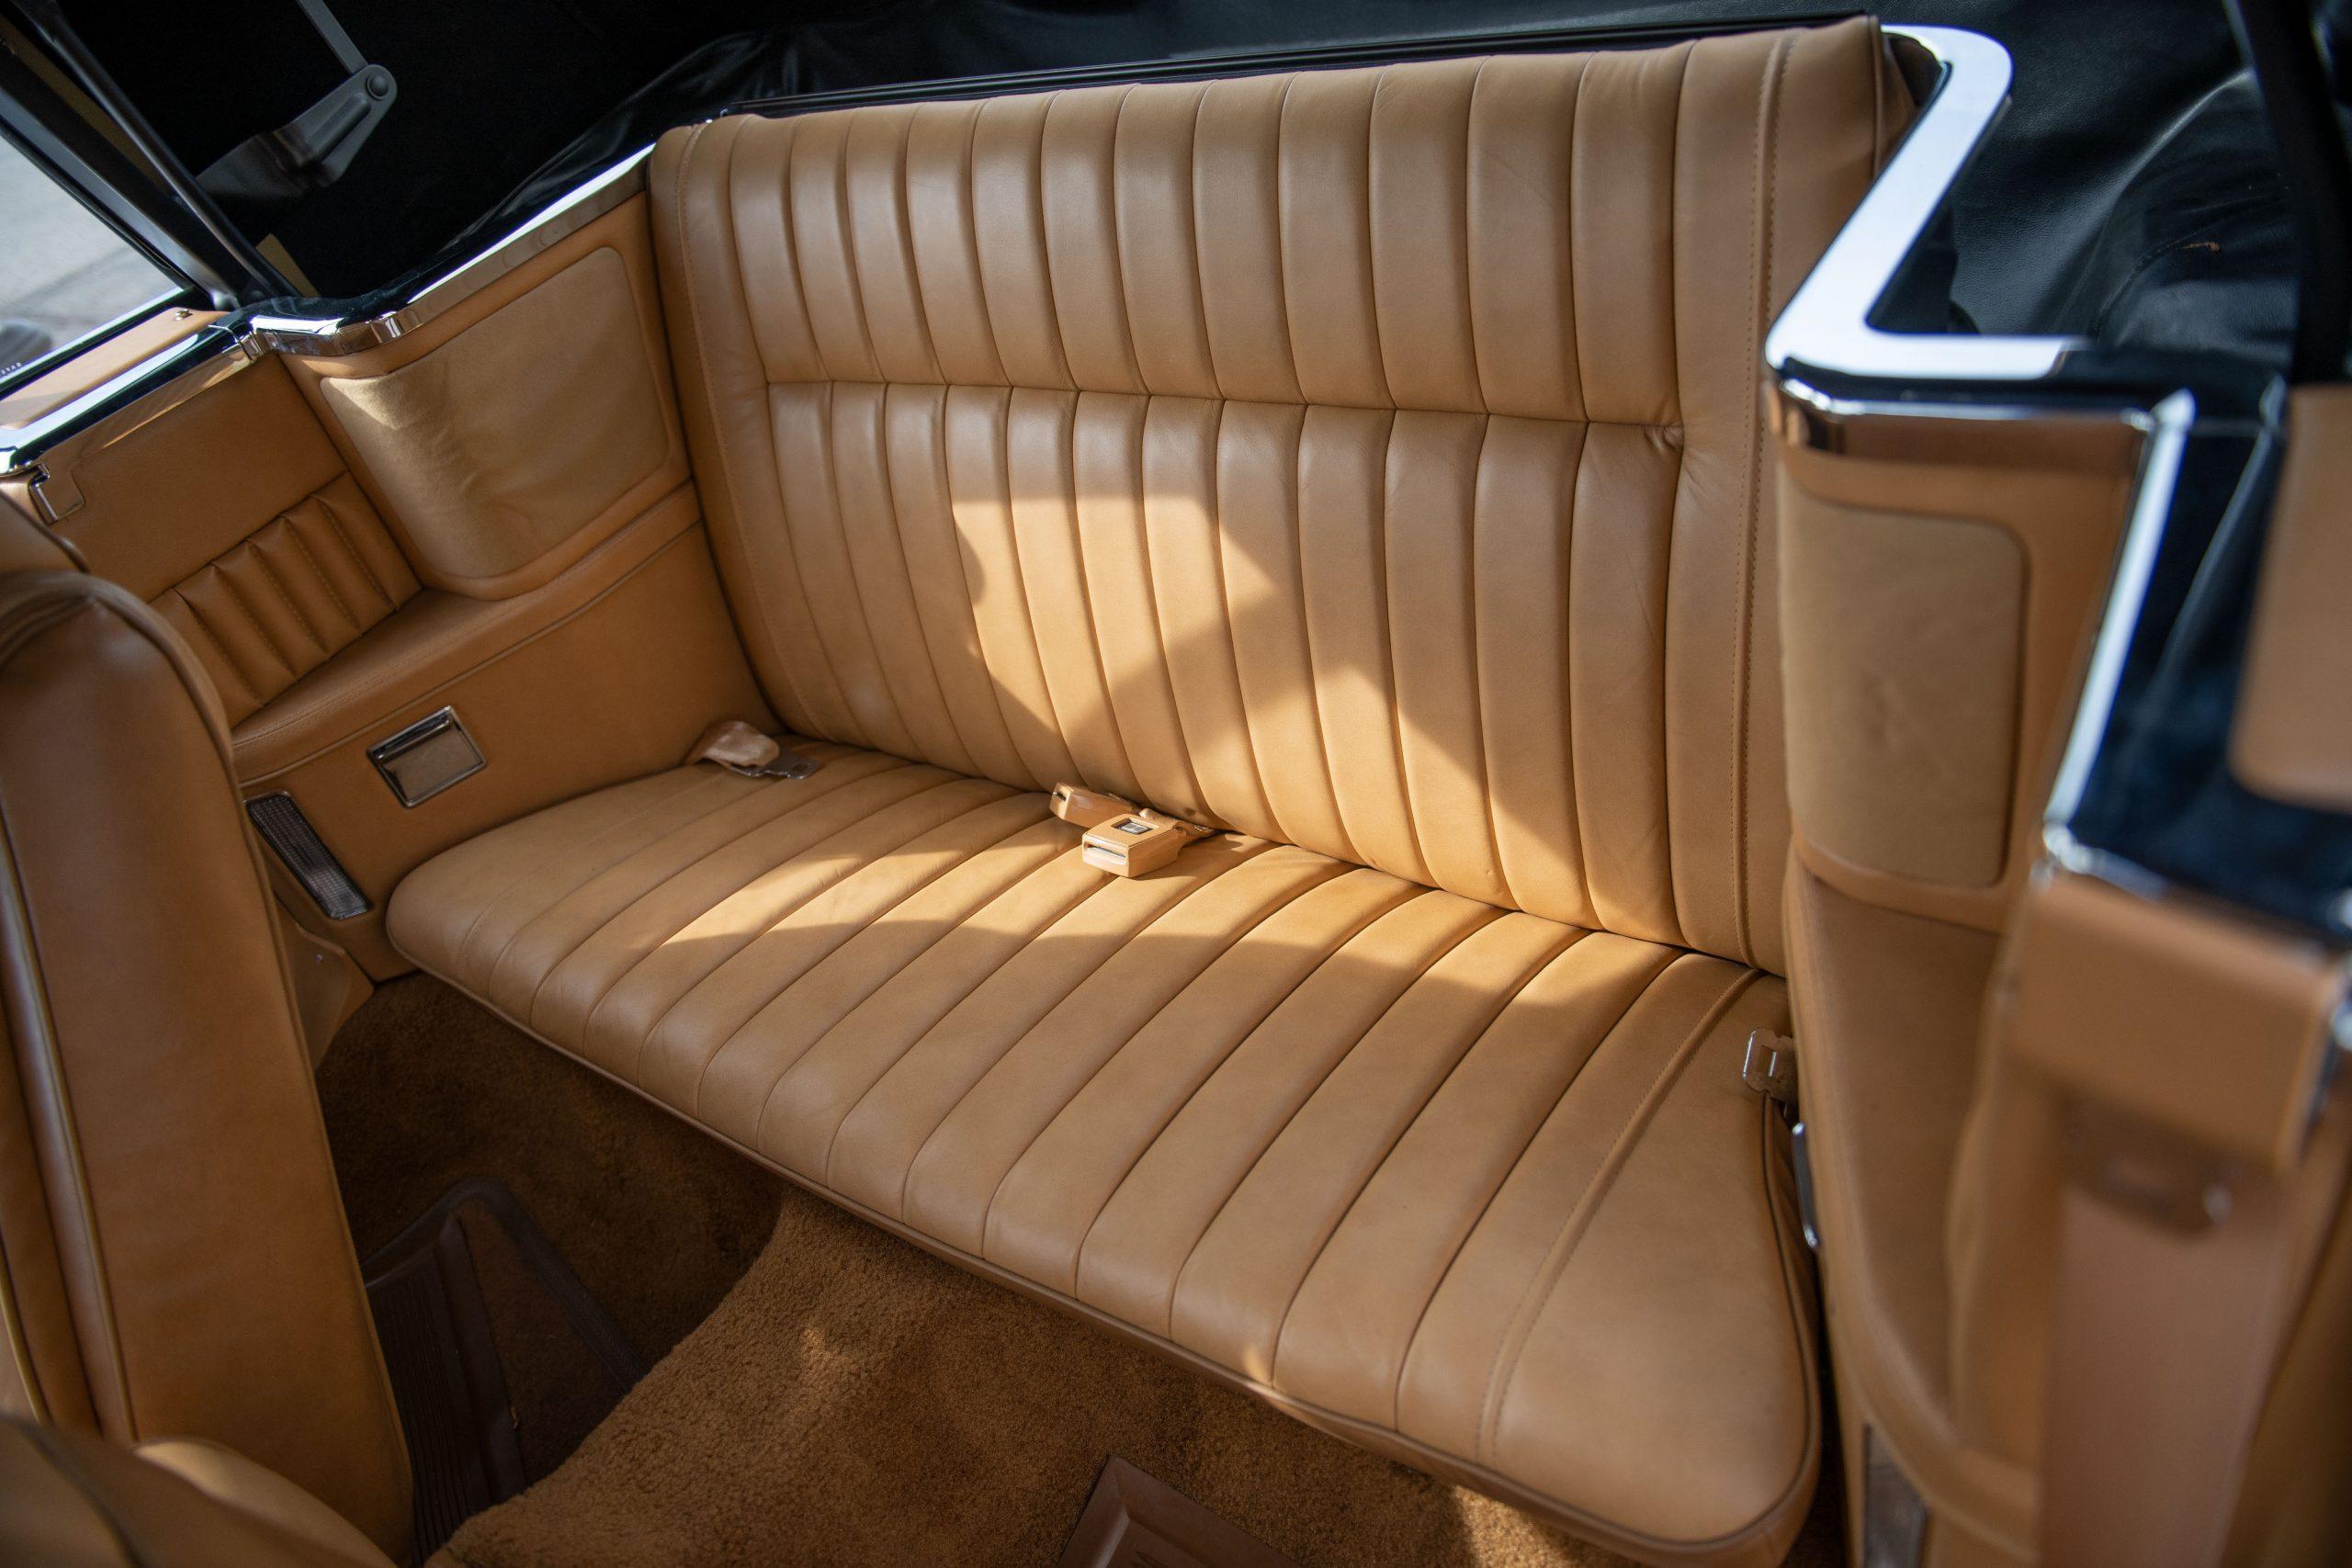 1985-Chrysler-LeBaron interior rear seat